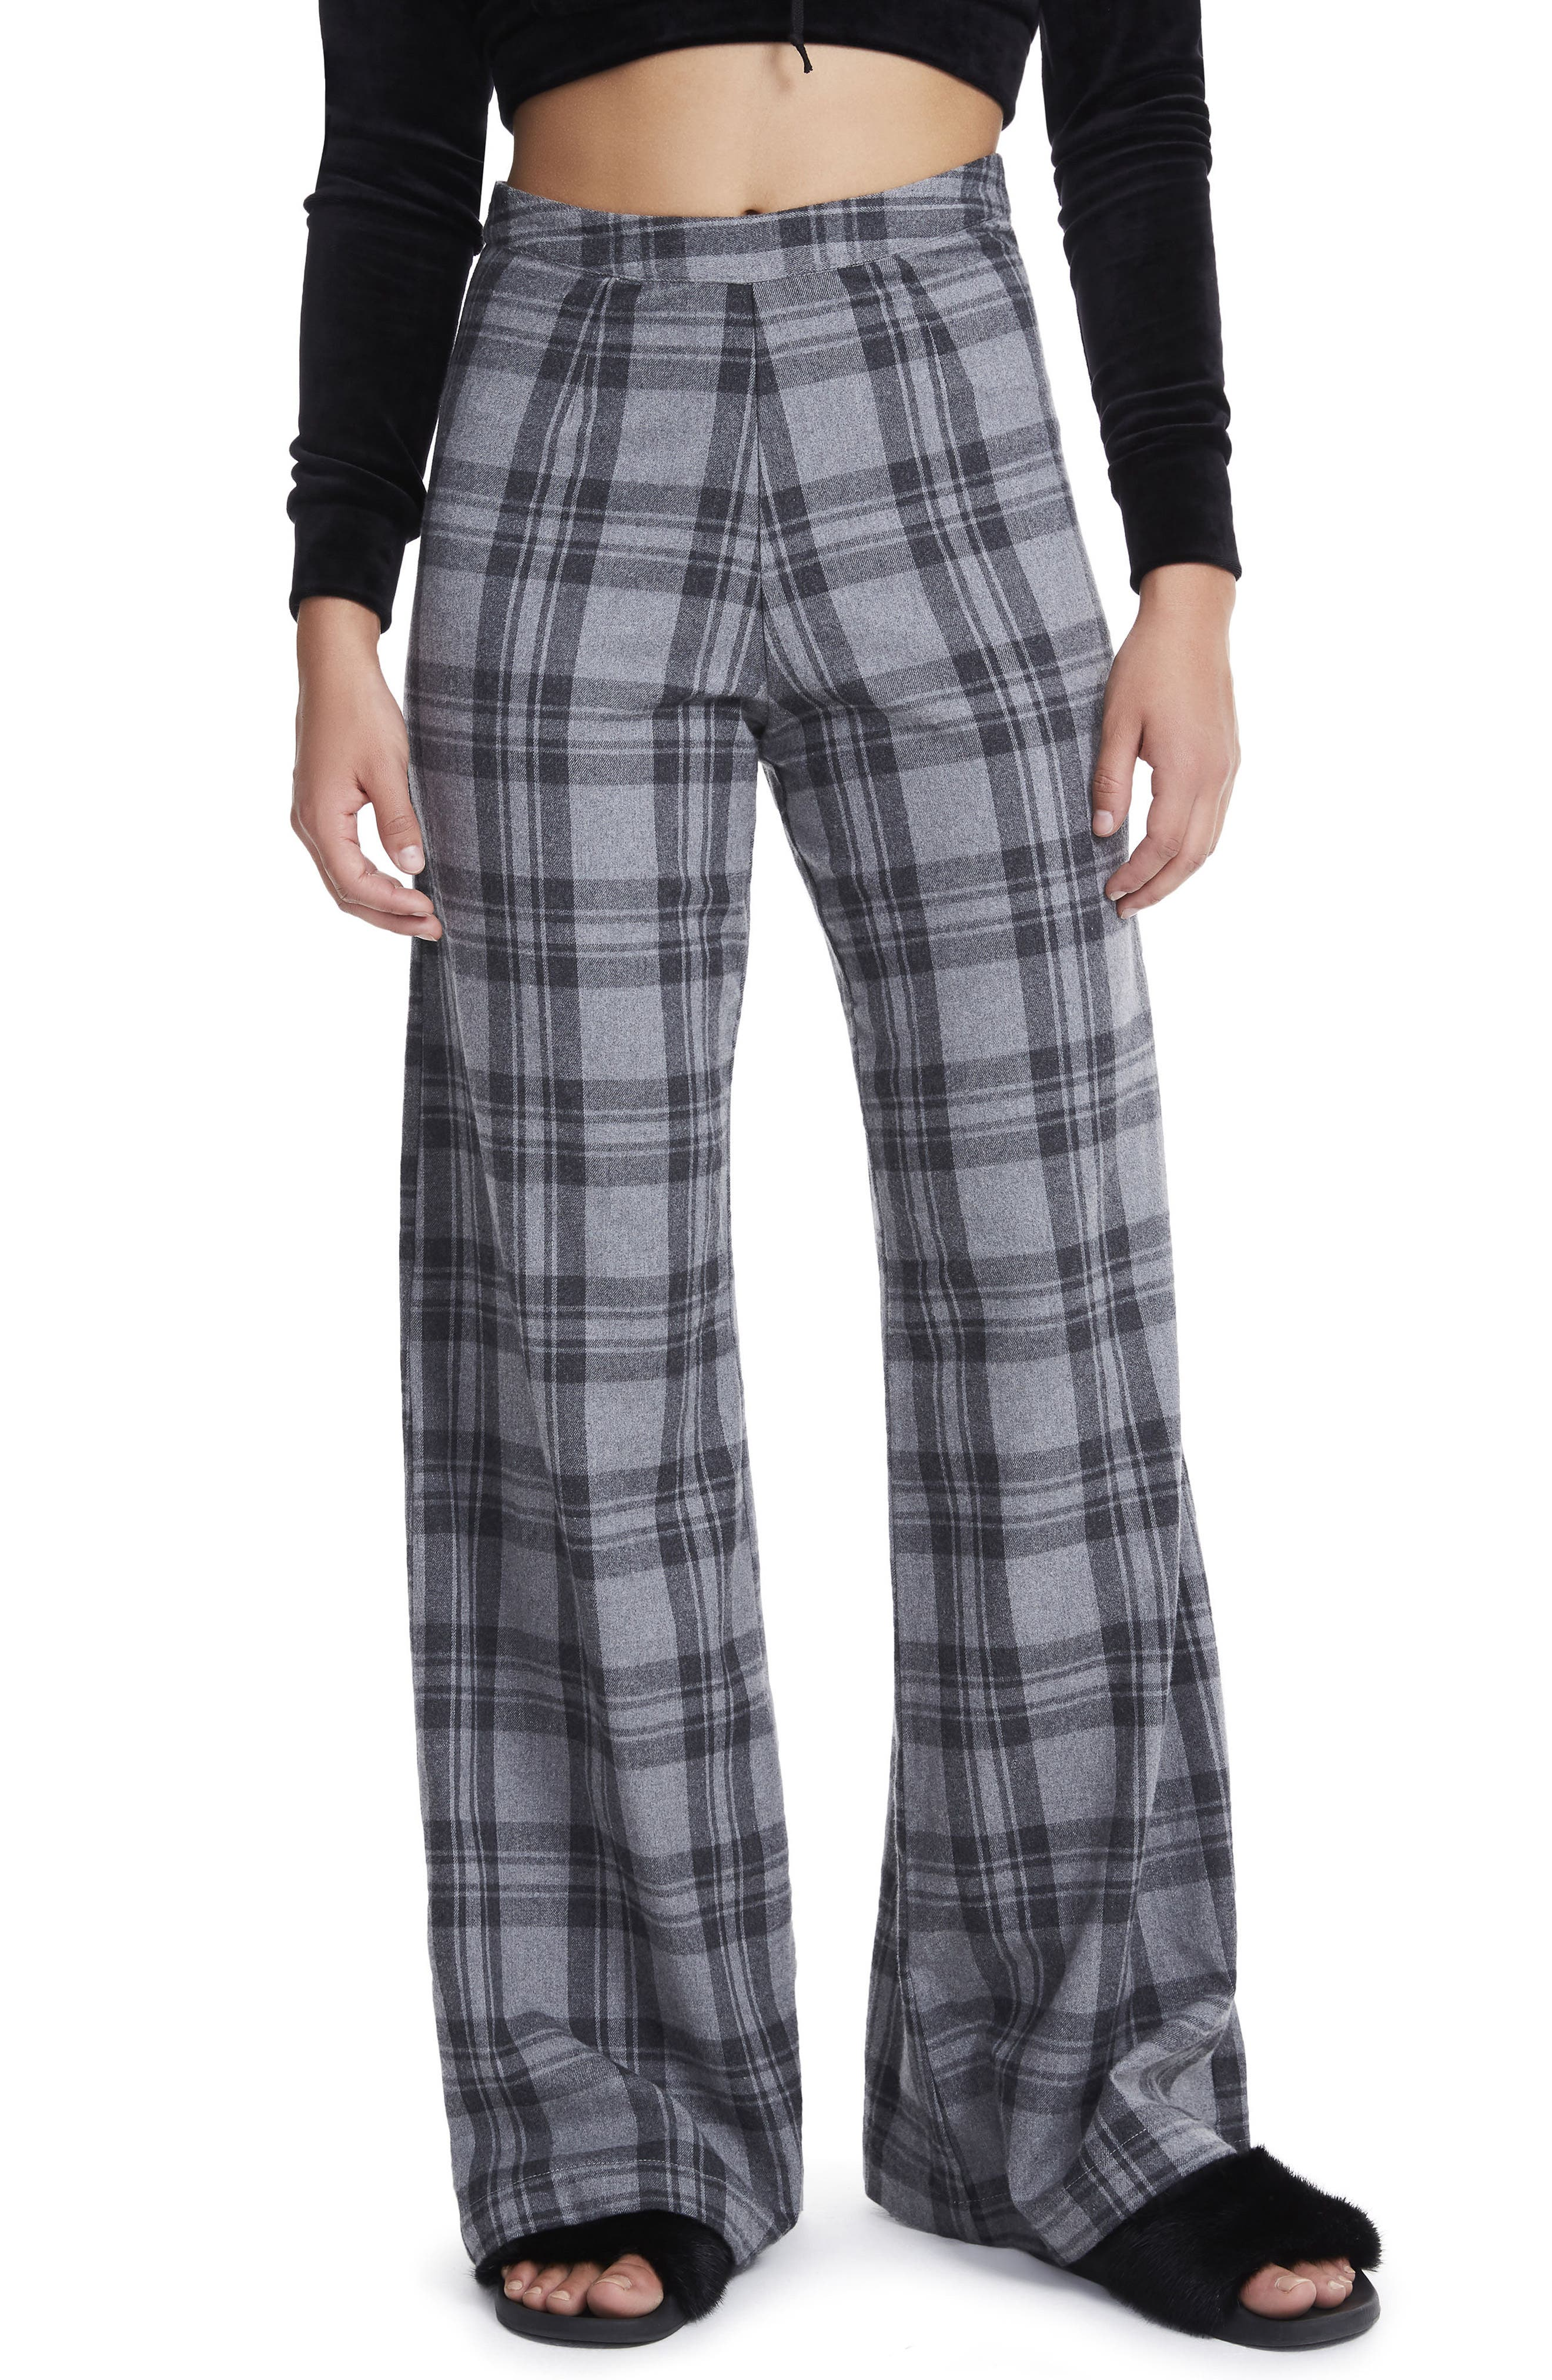 Carter High Waist Wide Leg Pants,                         Main,                         color, Grey Plaid